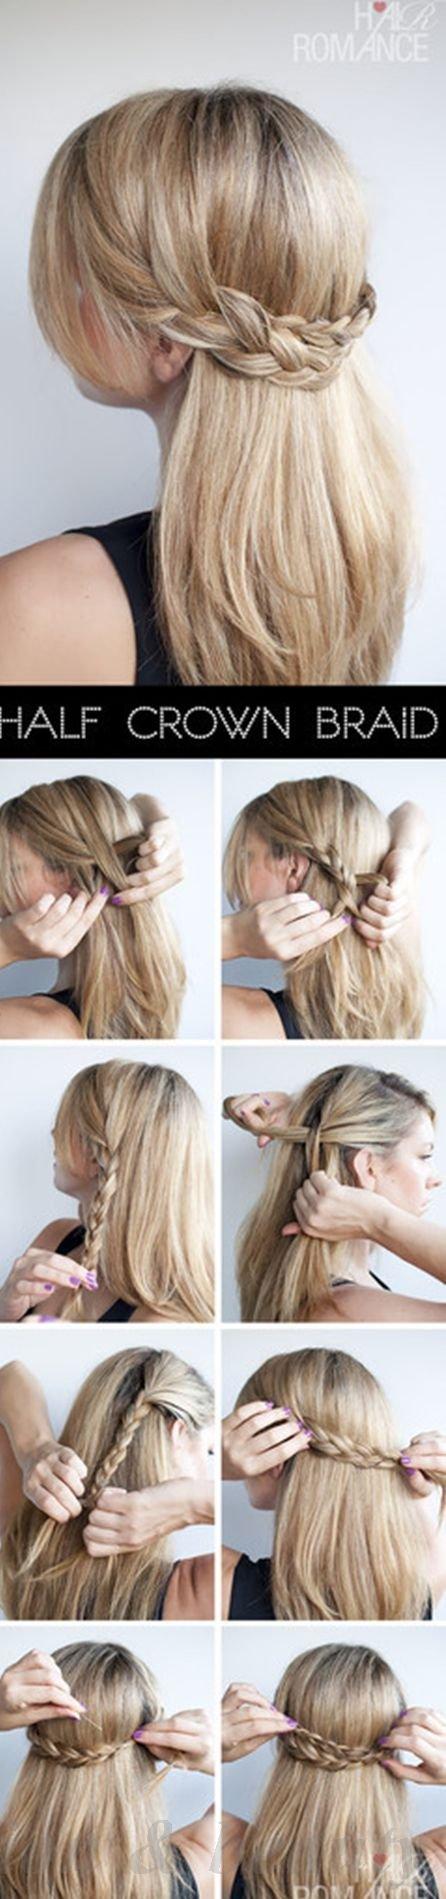 hair,hairstyle,blond,hair coloring,fur,